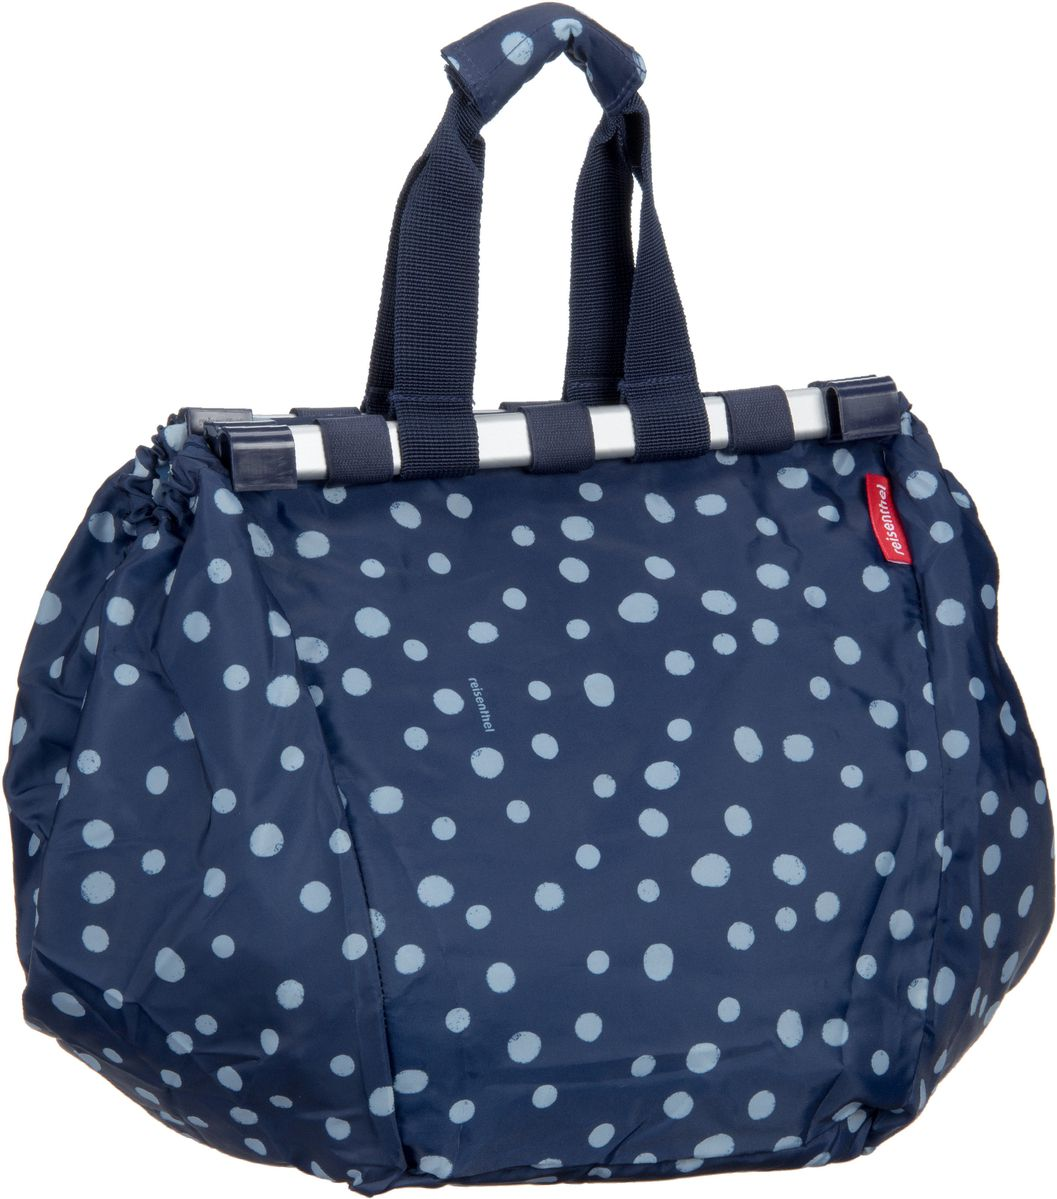 reisenthel Einkaufstasche easyshoppingbag Spots...